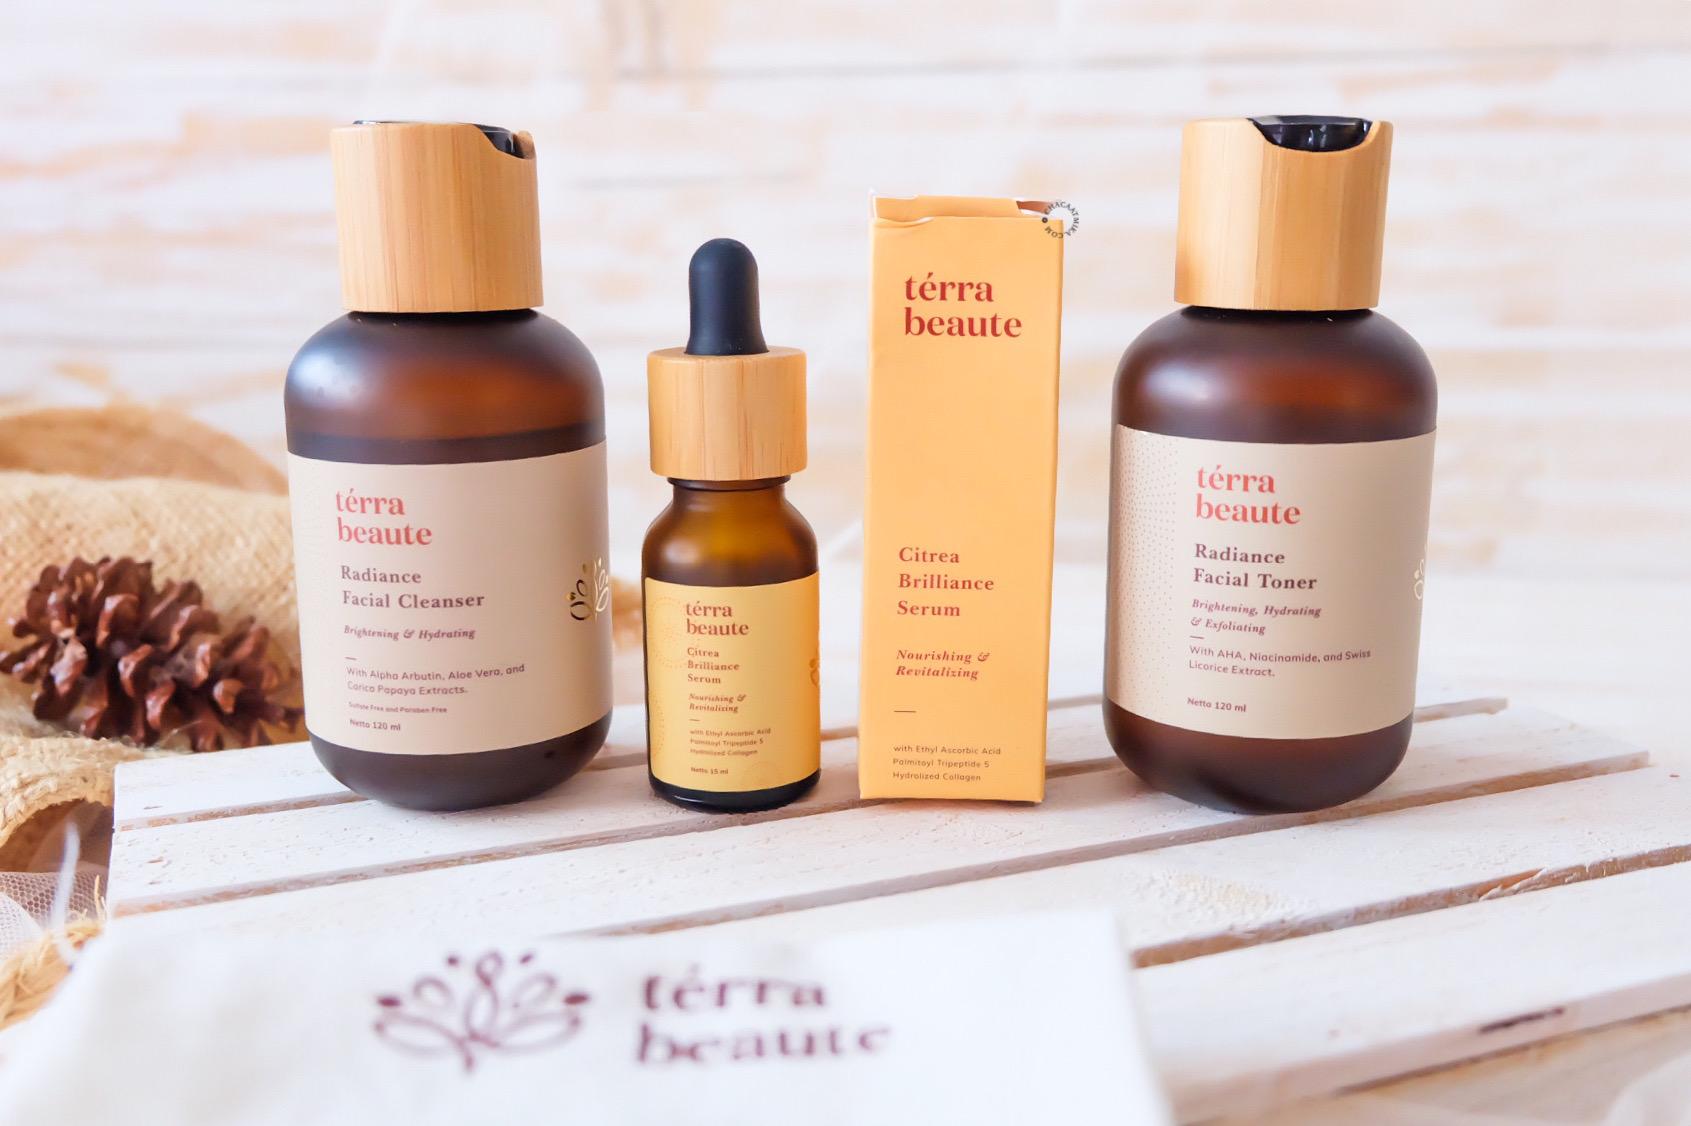 Review Terra Beaute Skin Care